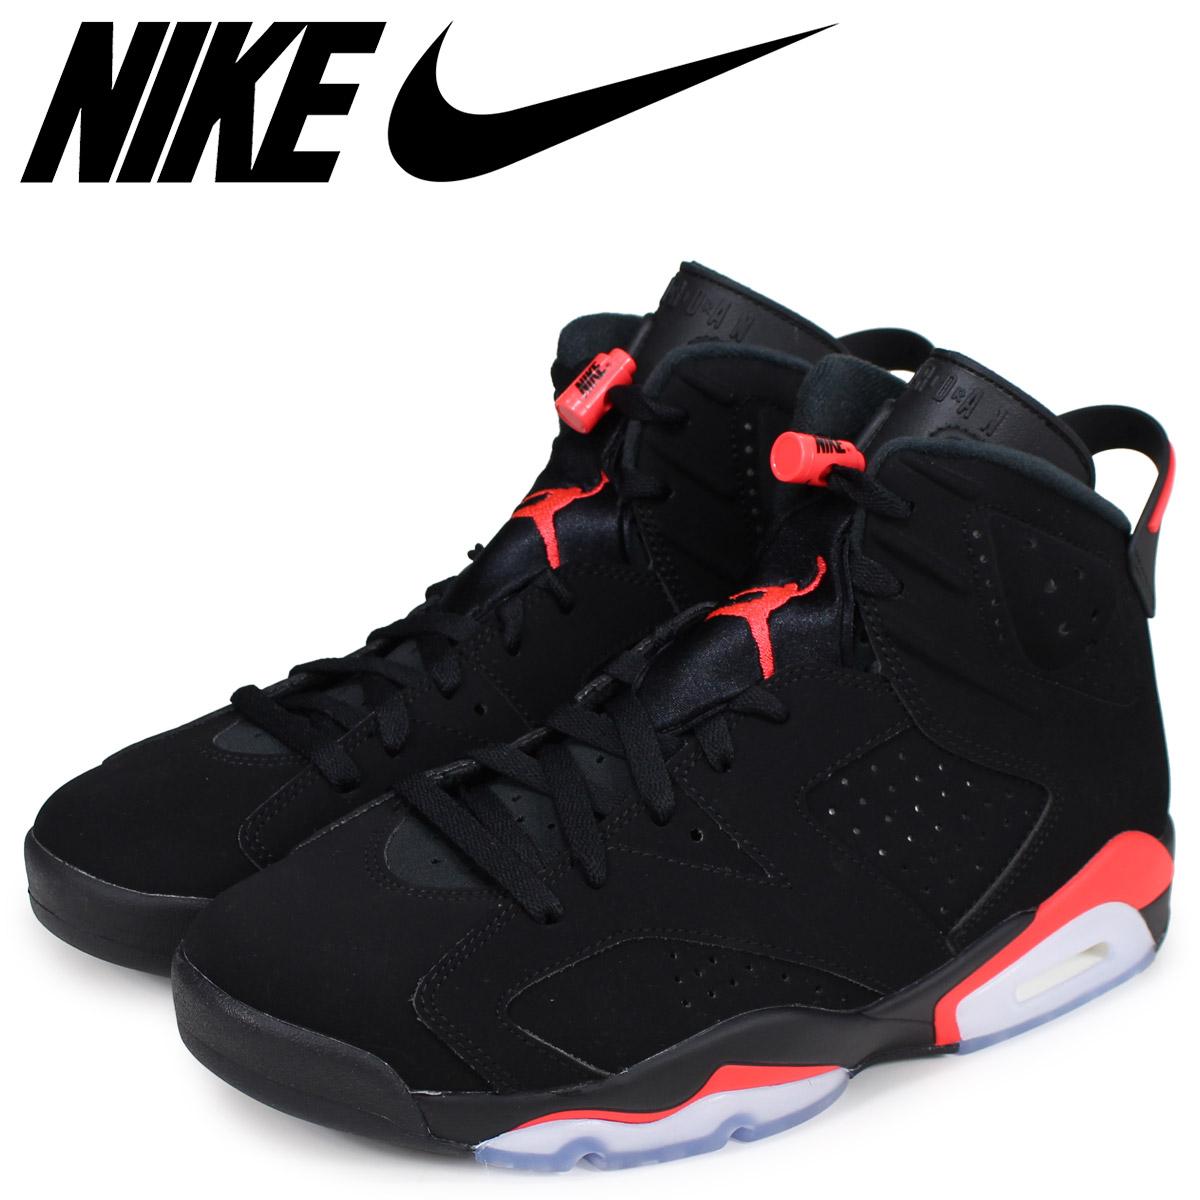 3d38862c6e17 NIKE Nike Air Jordan 6 nostalgic sneakers men AIR JORDAN 6 RETRO black  384